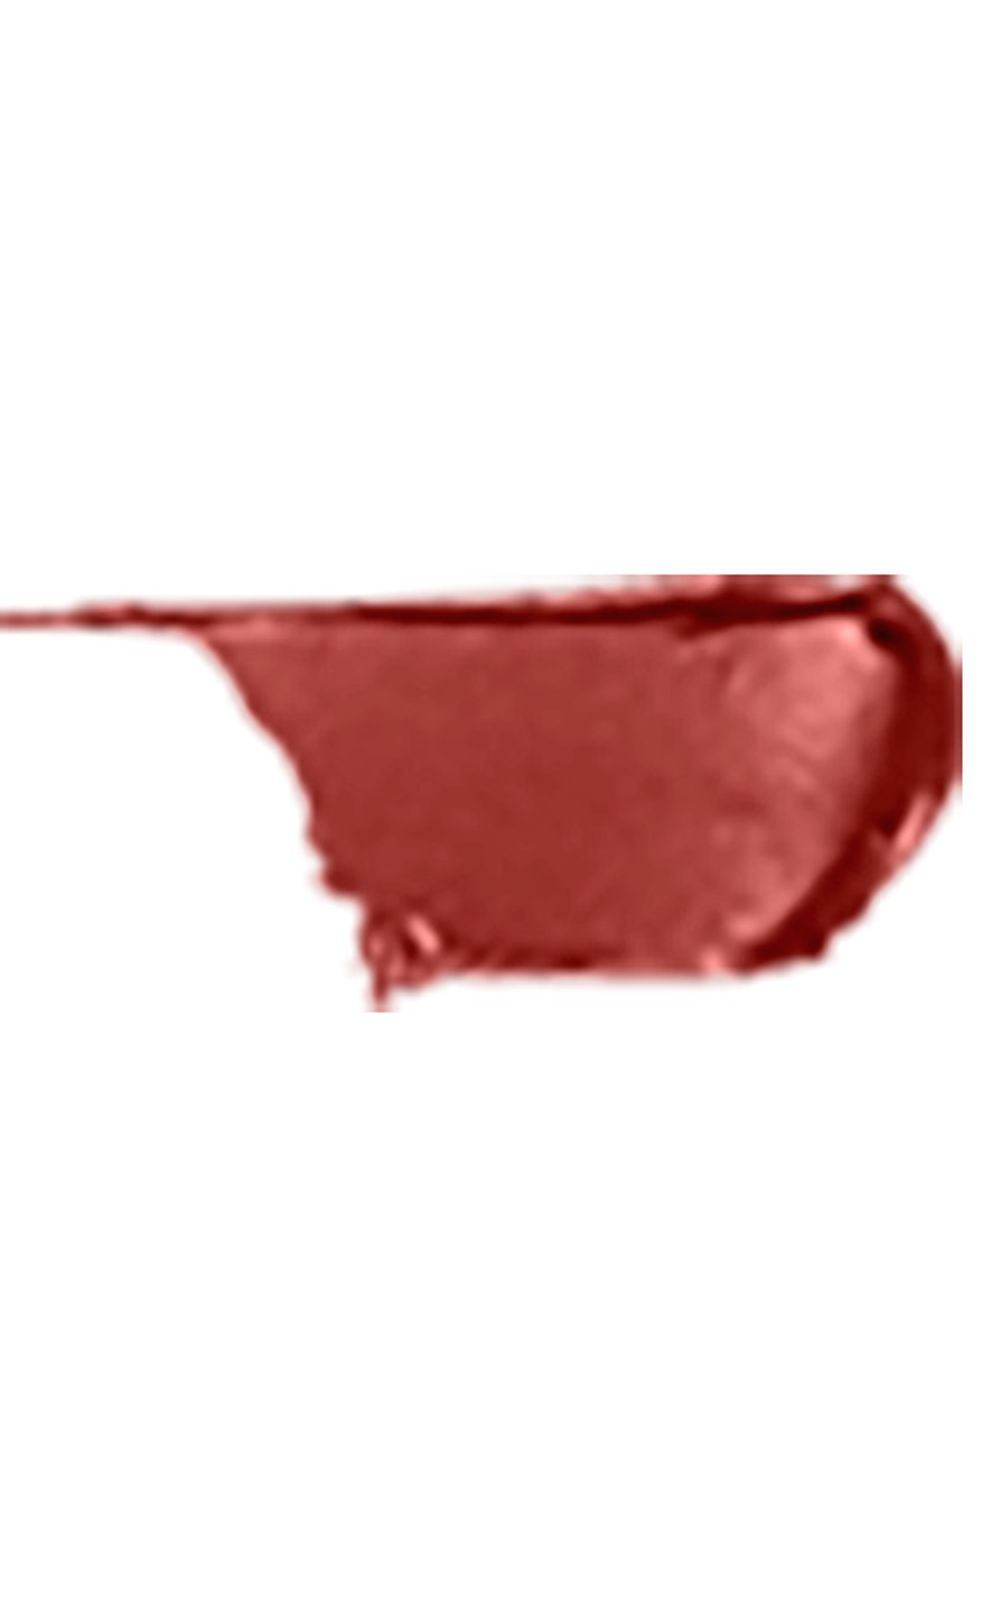 Foto 3 - Red Carpet Hot Makeup - Batom - RCL09 - Dim the Light